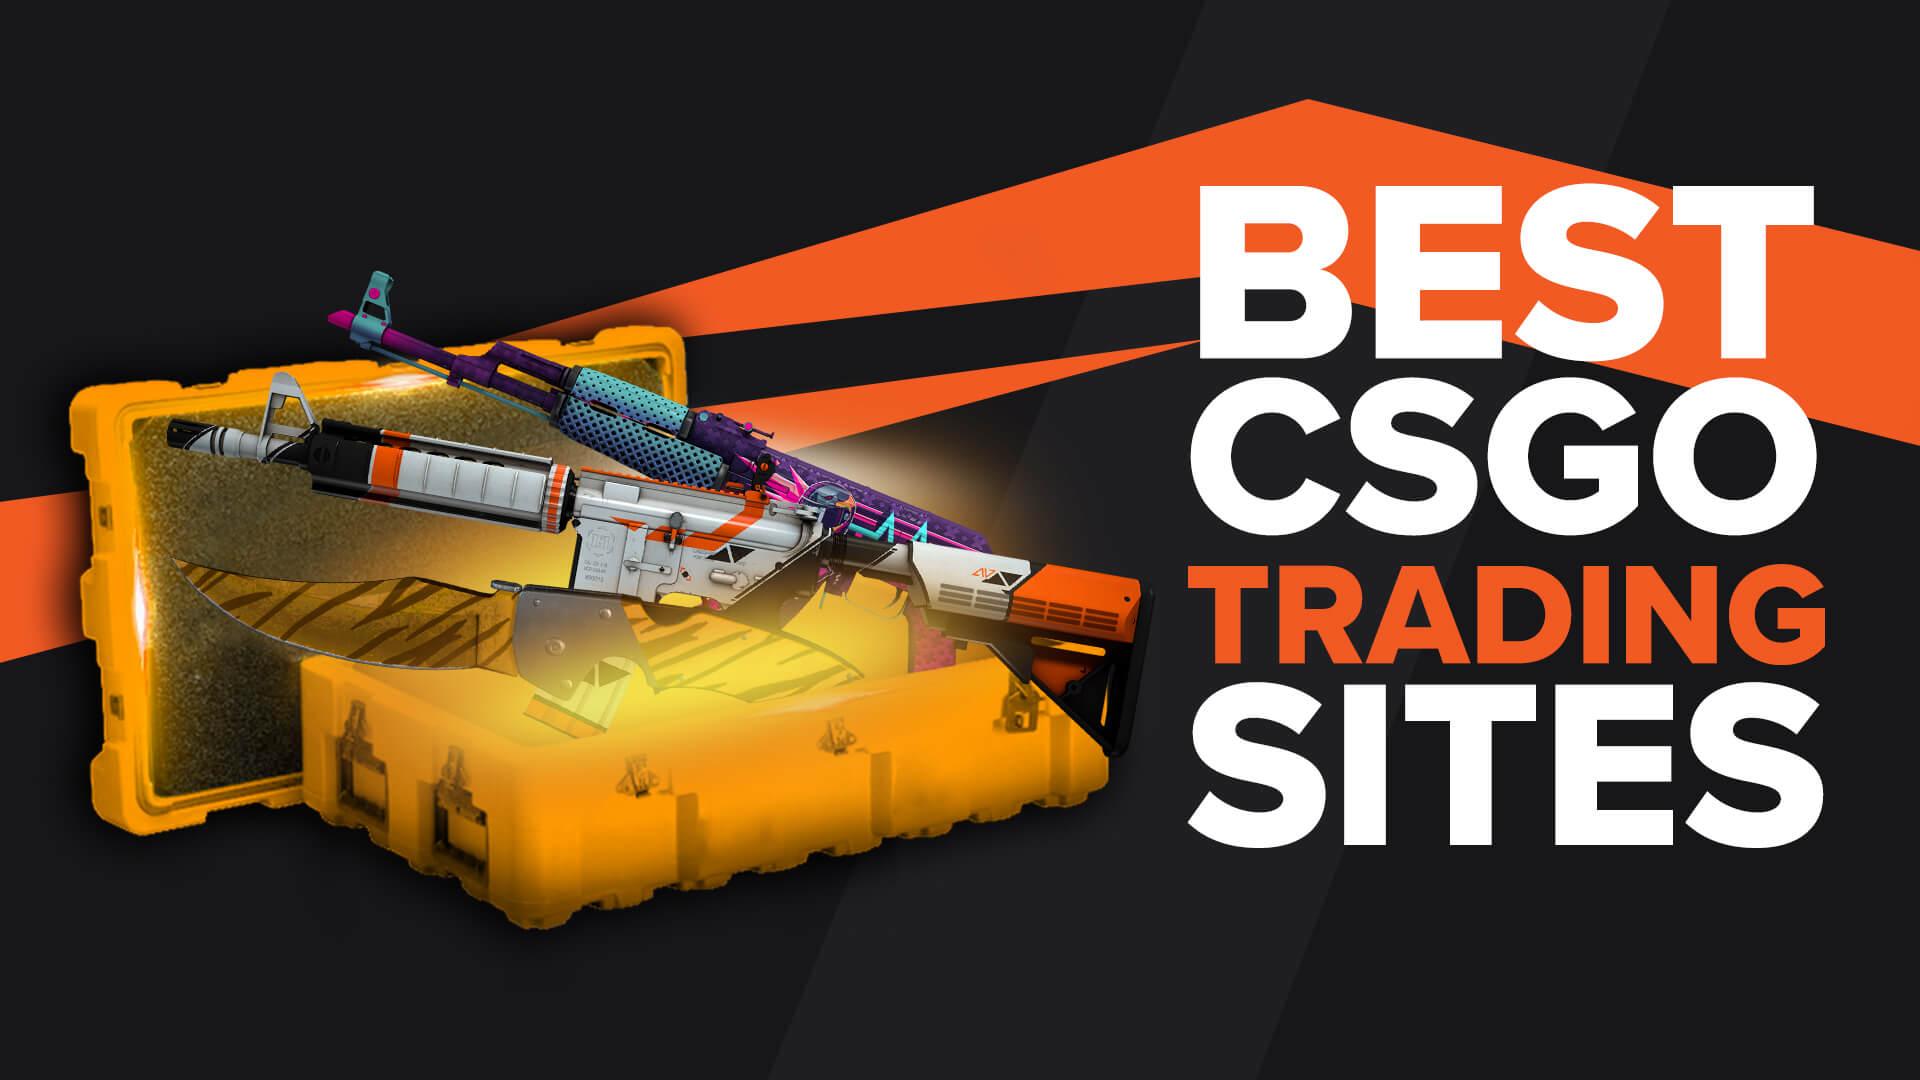 best skin csgo trading sites